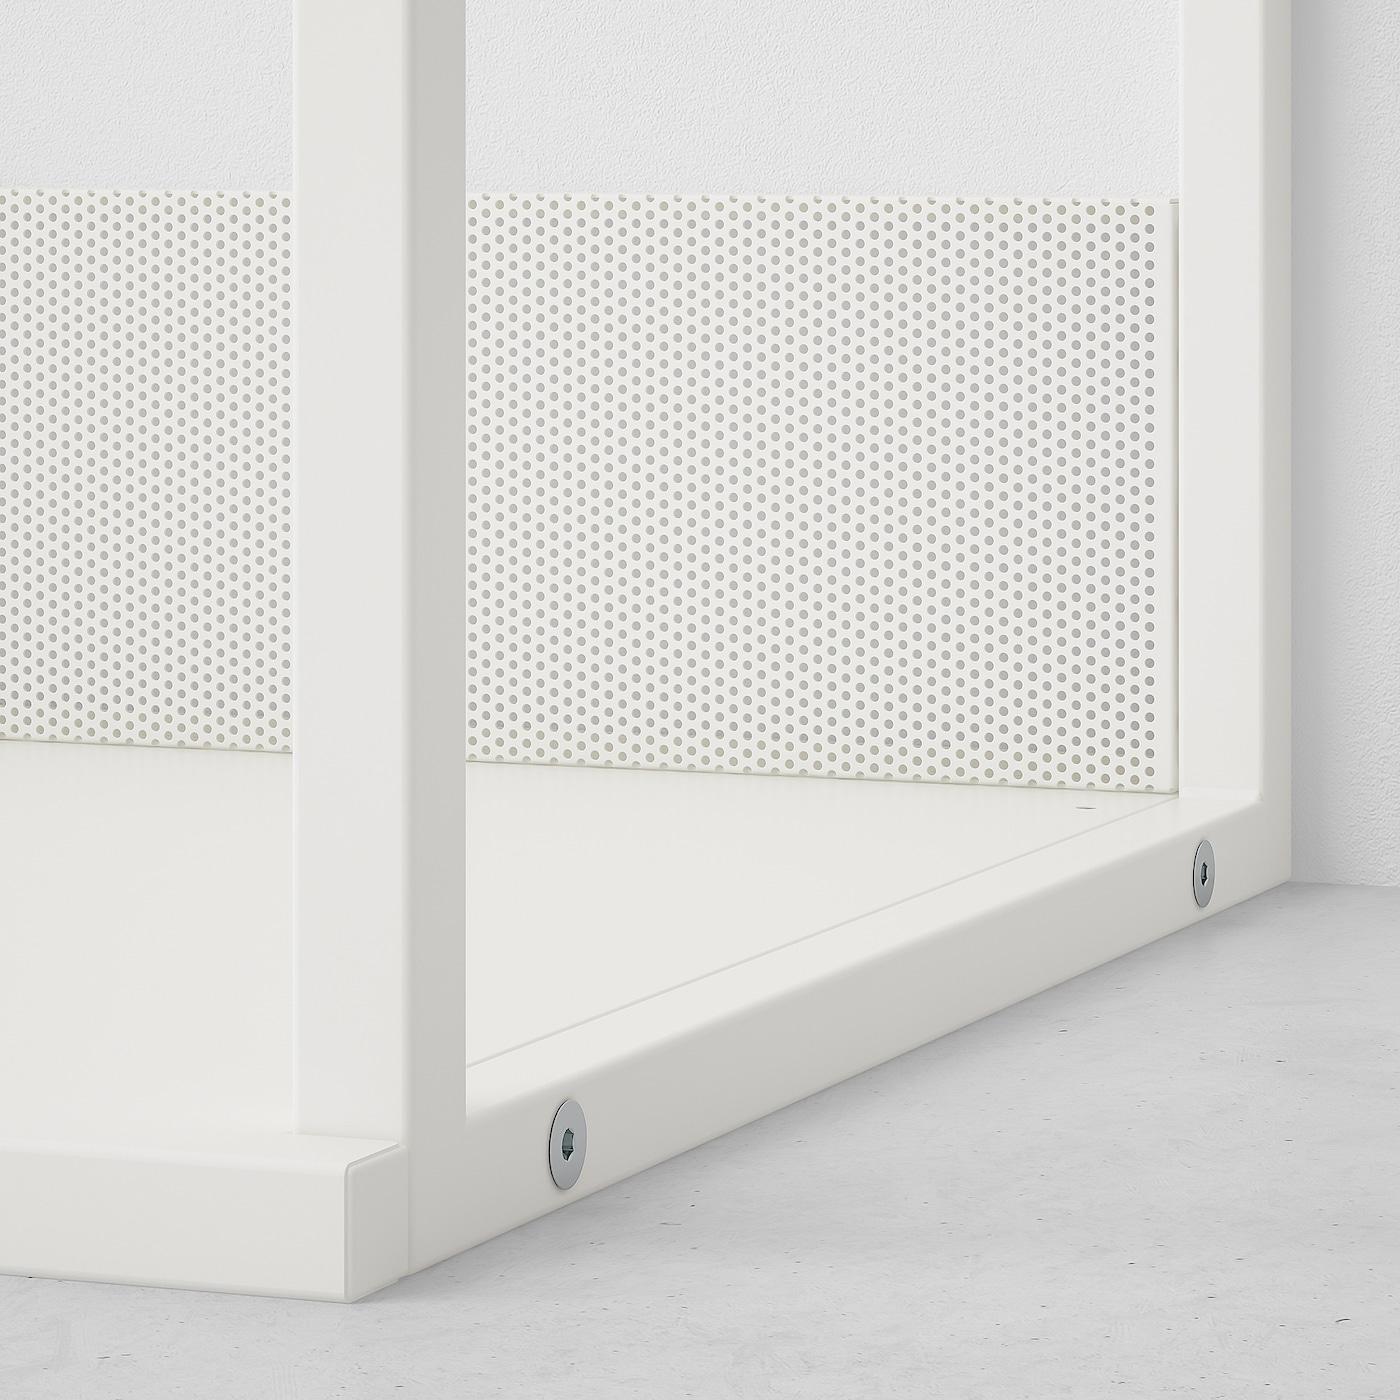 PLATSA Open shelving unit, white, 60x40x40 cm